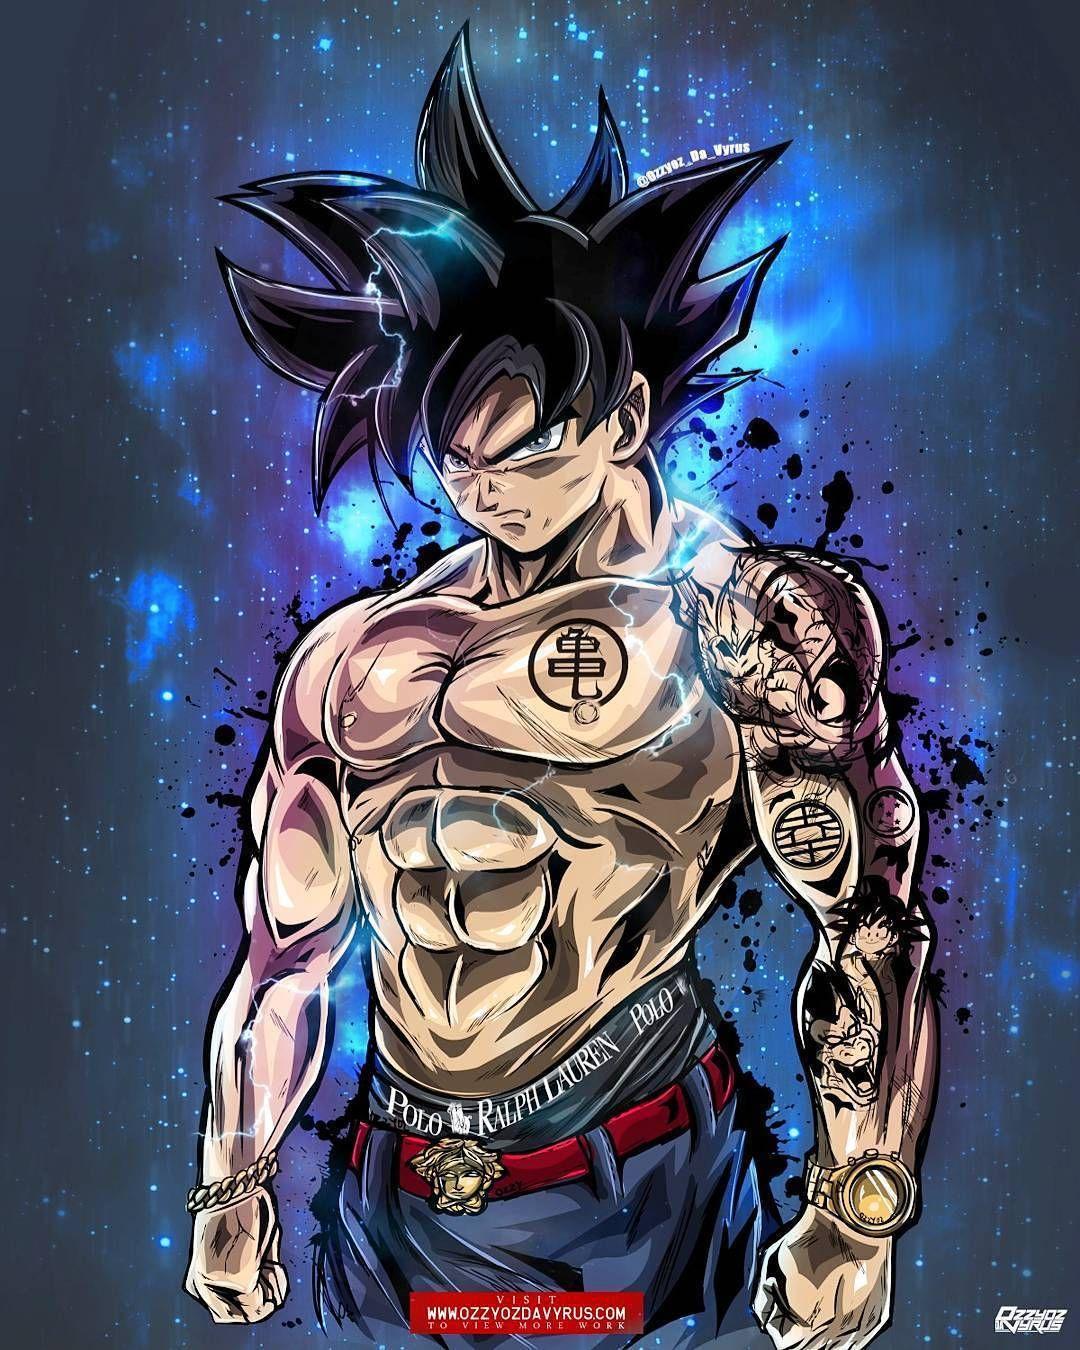 No Hay Texto Alternativo Automatico Disponible Dragon Ball Super Manga Anime Dragon Ball Super Dragon Ball Artwork